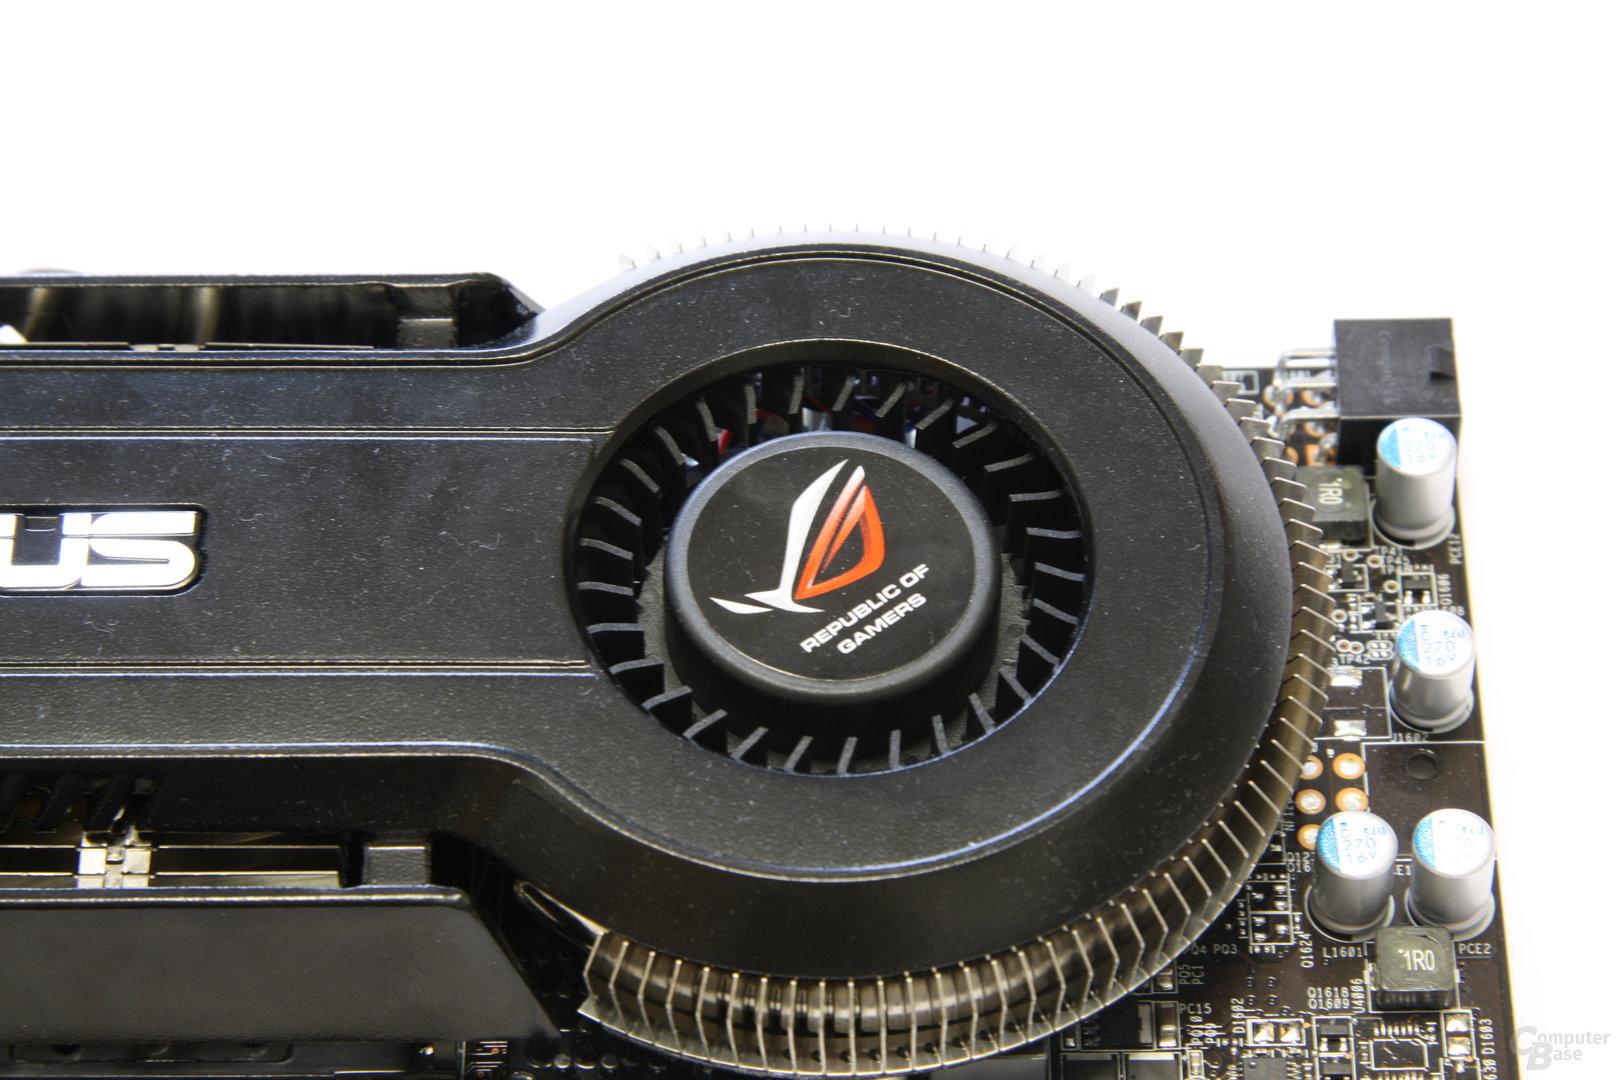 Radeon HD 4850 Matrix Lüfter